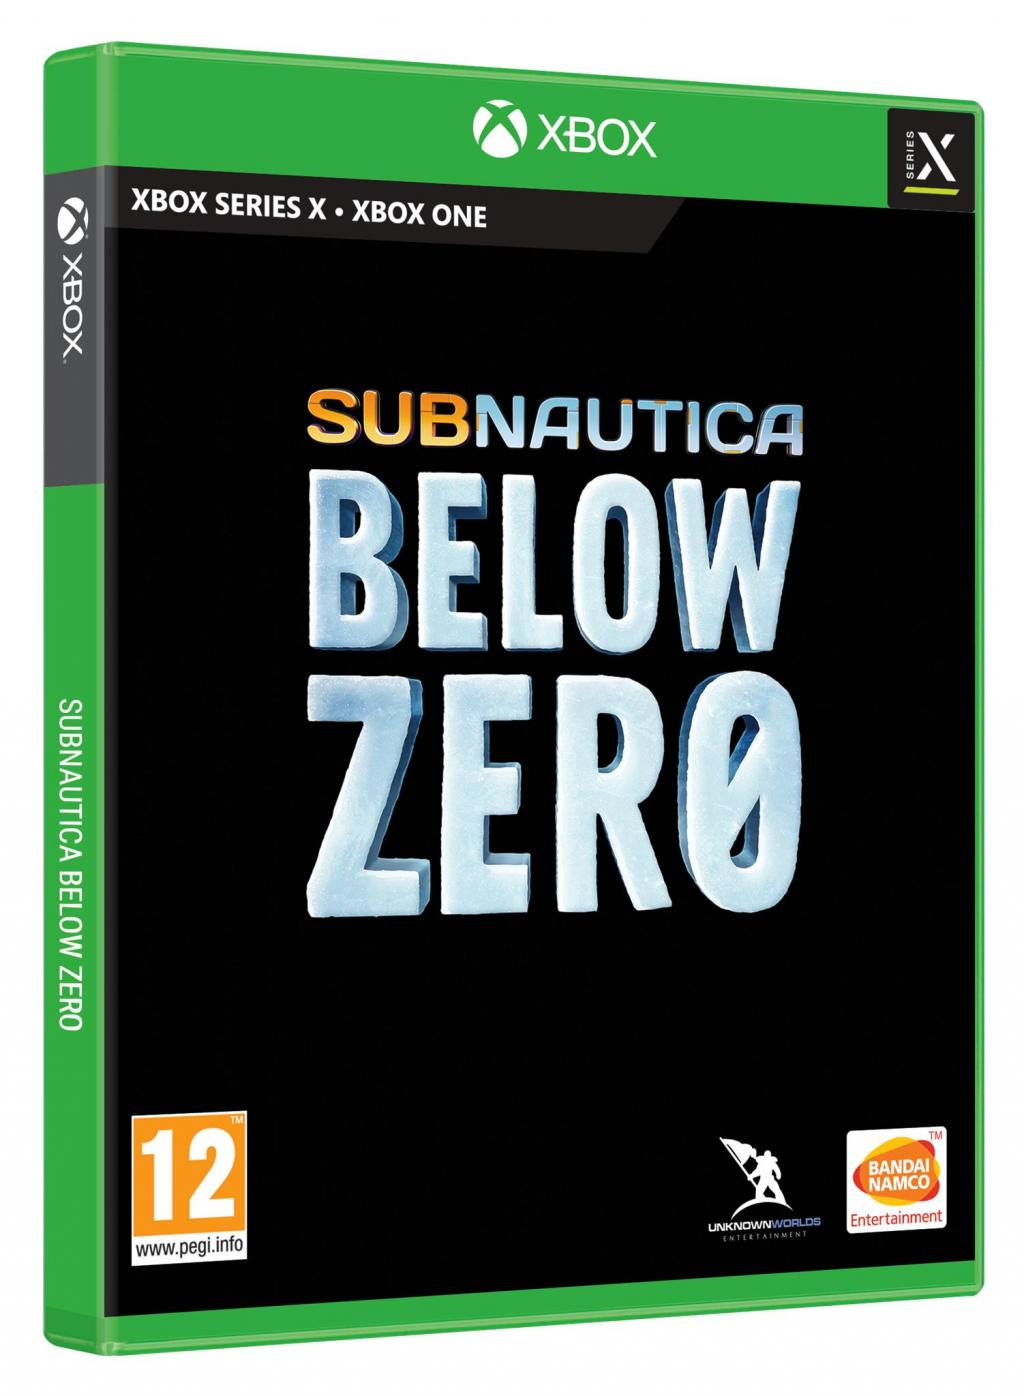 Subnautica: Below Zero XBOX SX / XBOX ONE_1